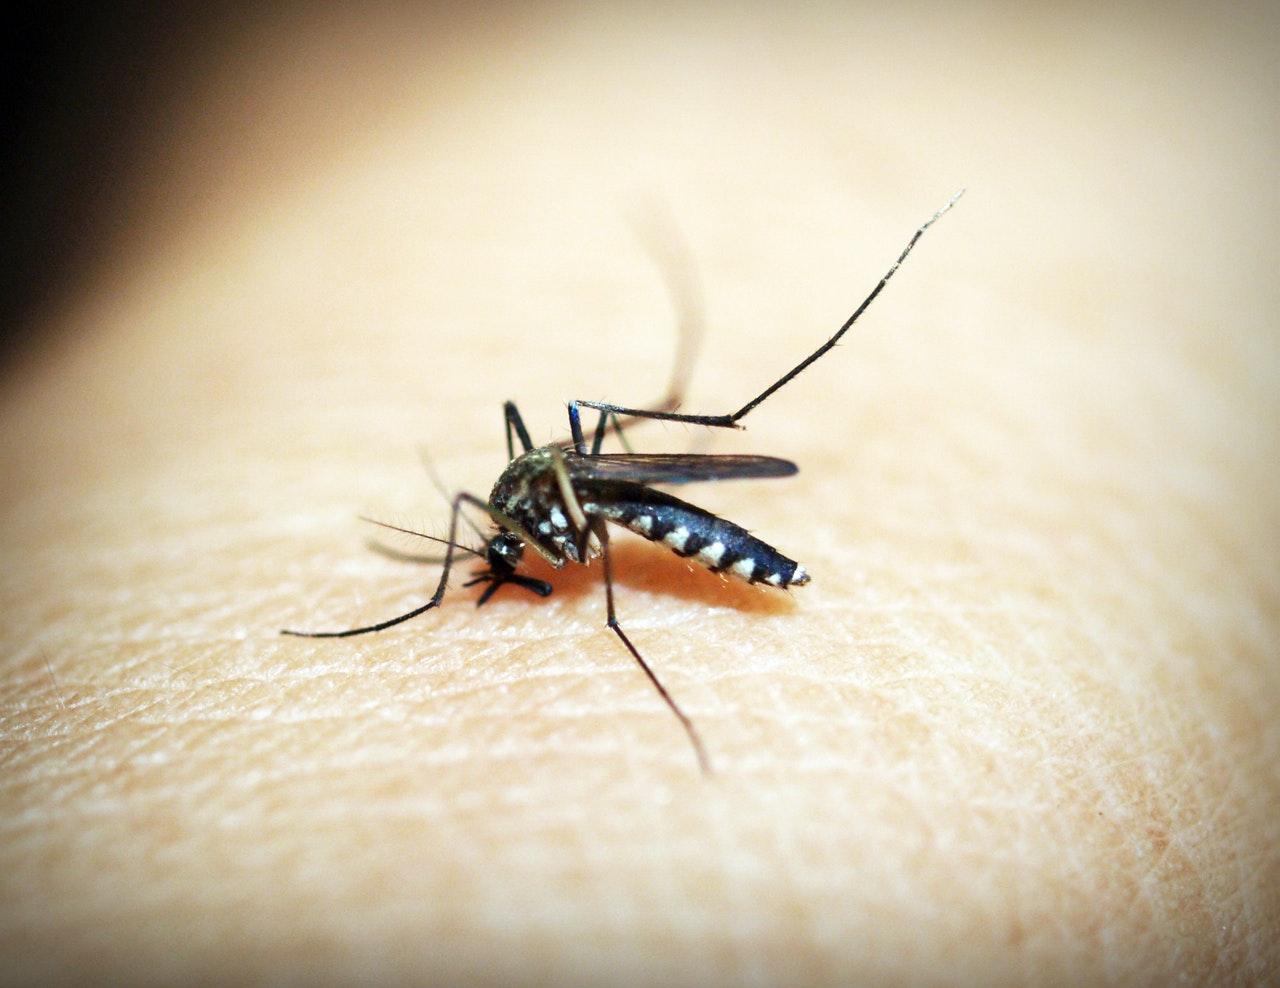 Mosquito Treatment, Professional Mosquito Treatment Benefits